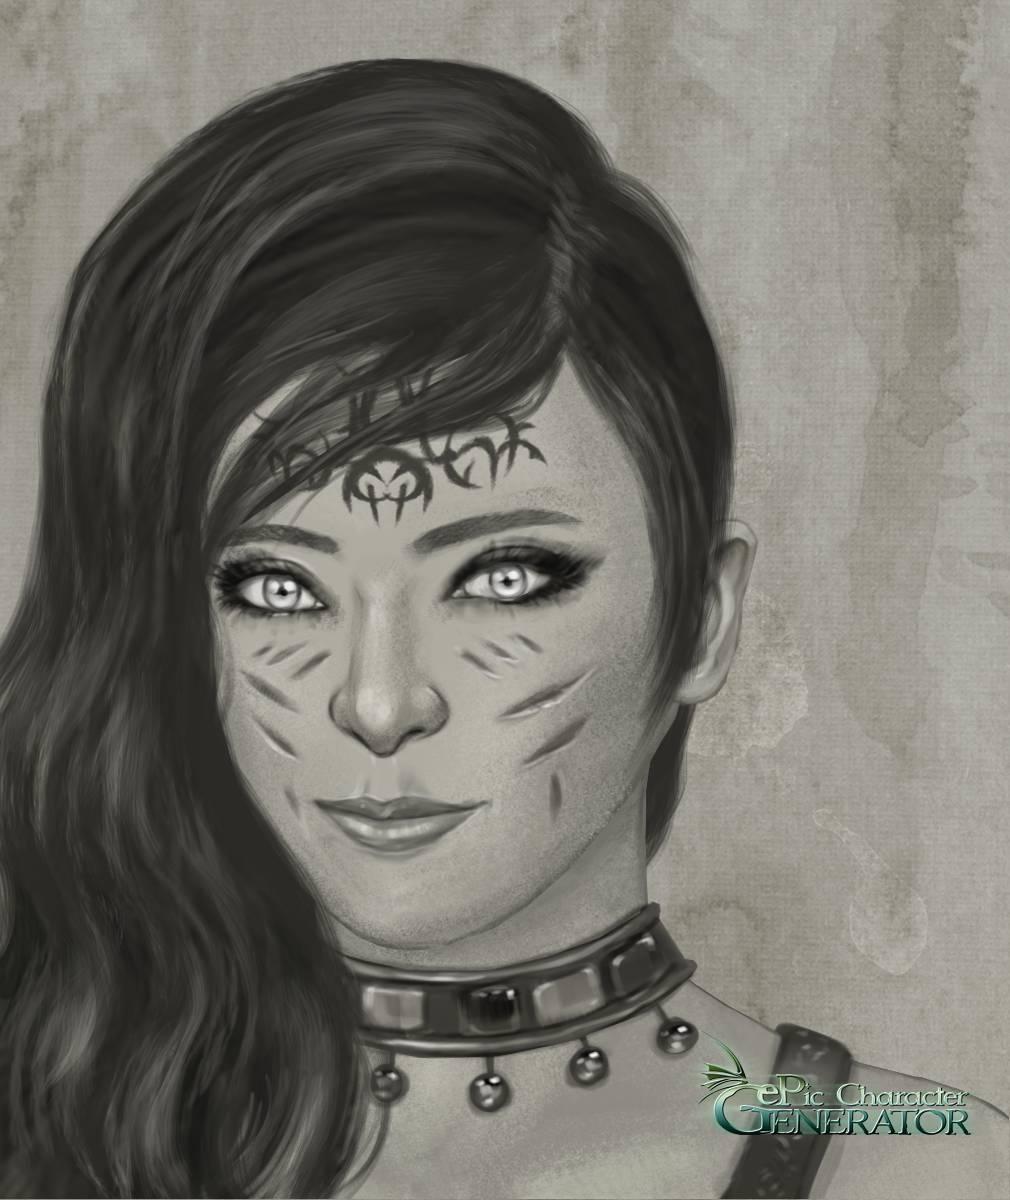 ePic Character Generator Season 3 Female Portrait Screenshot 05